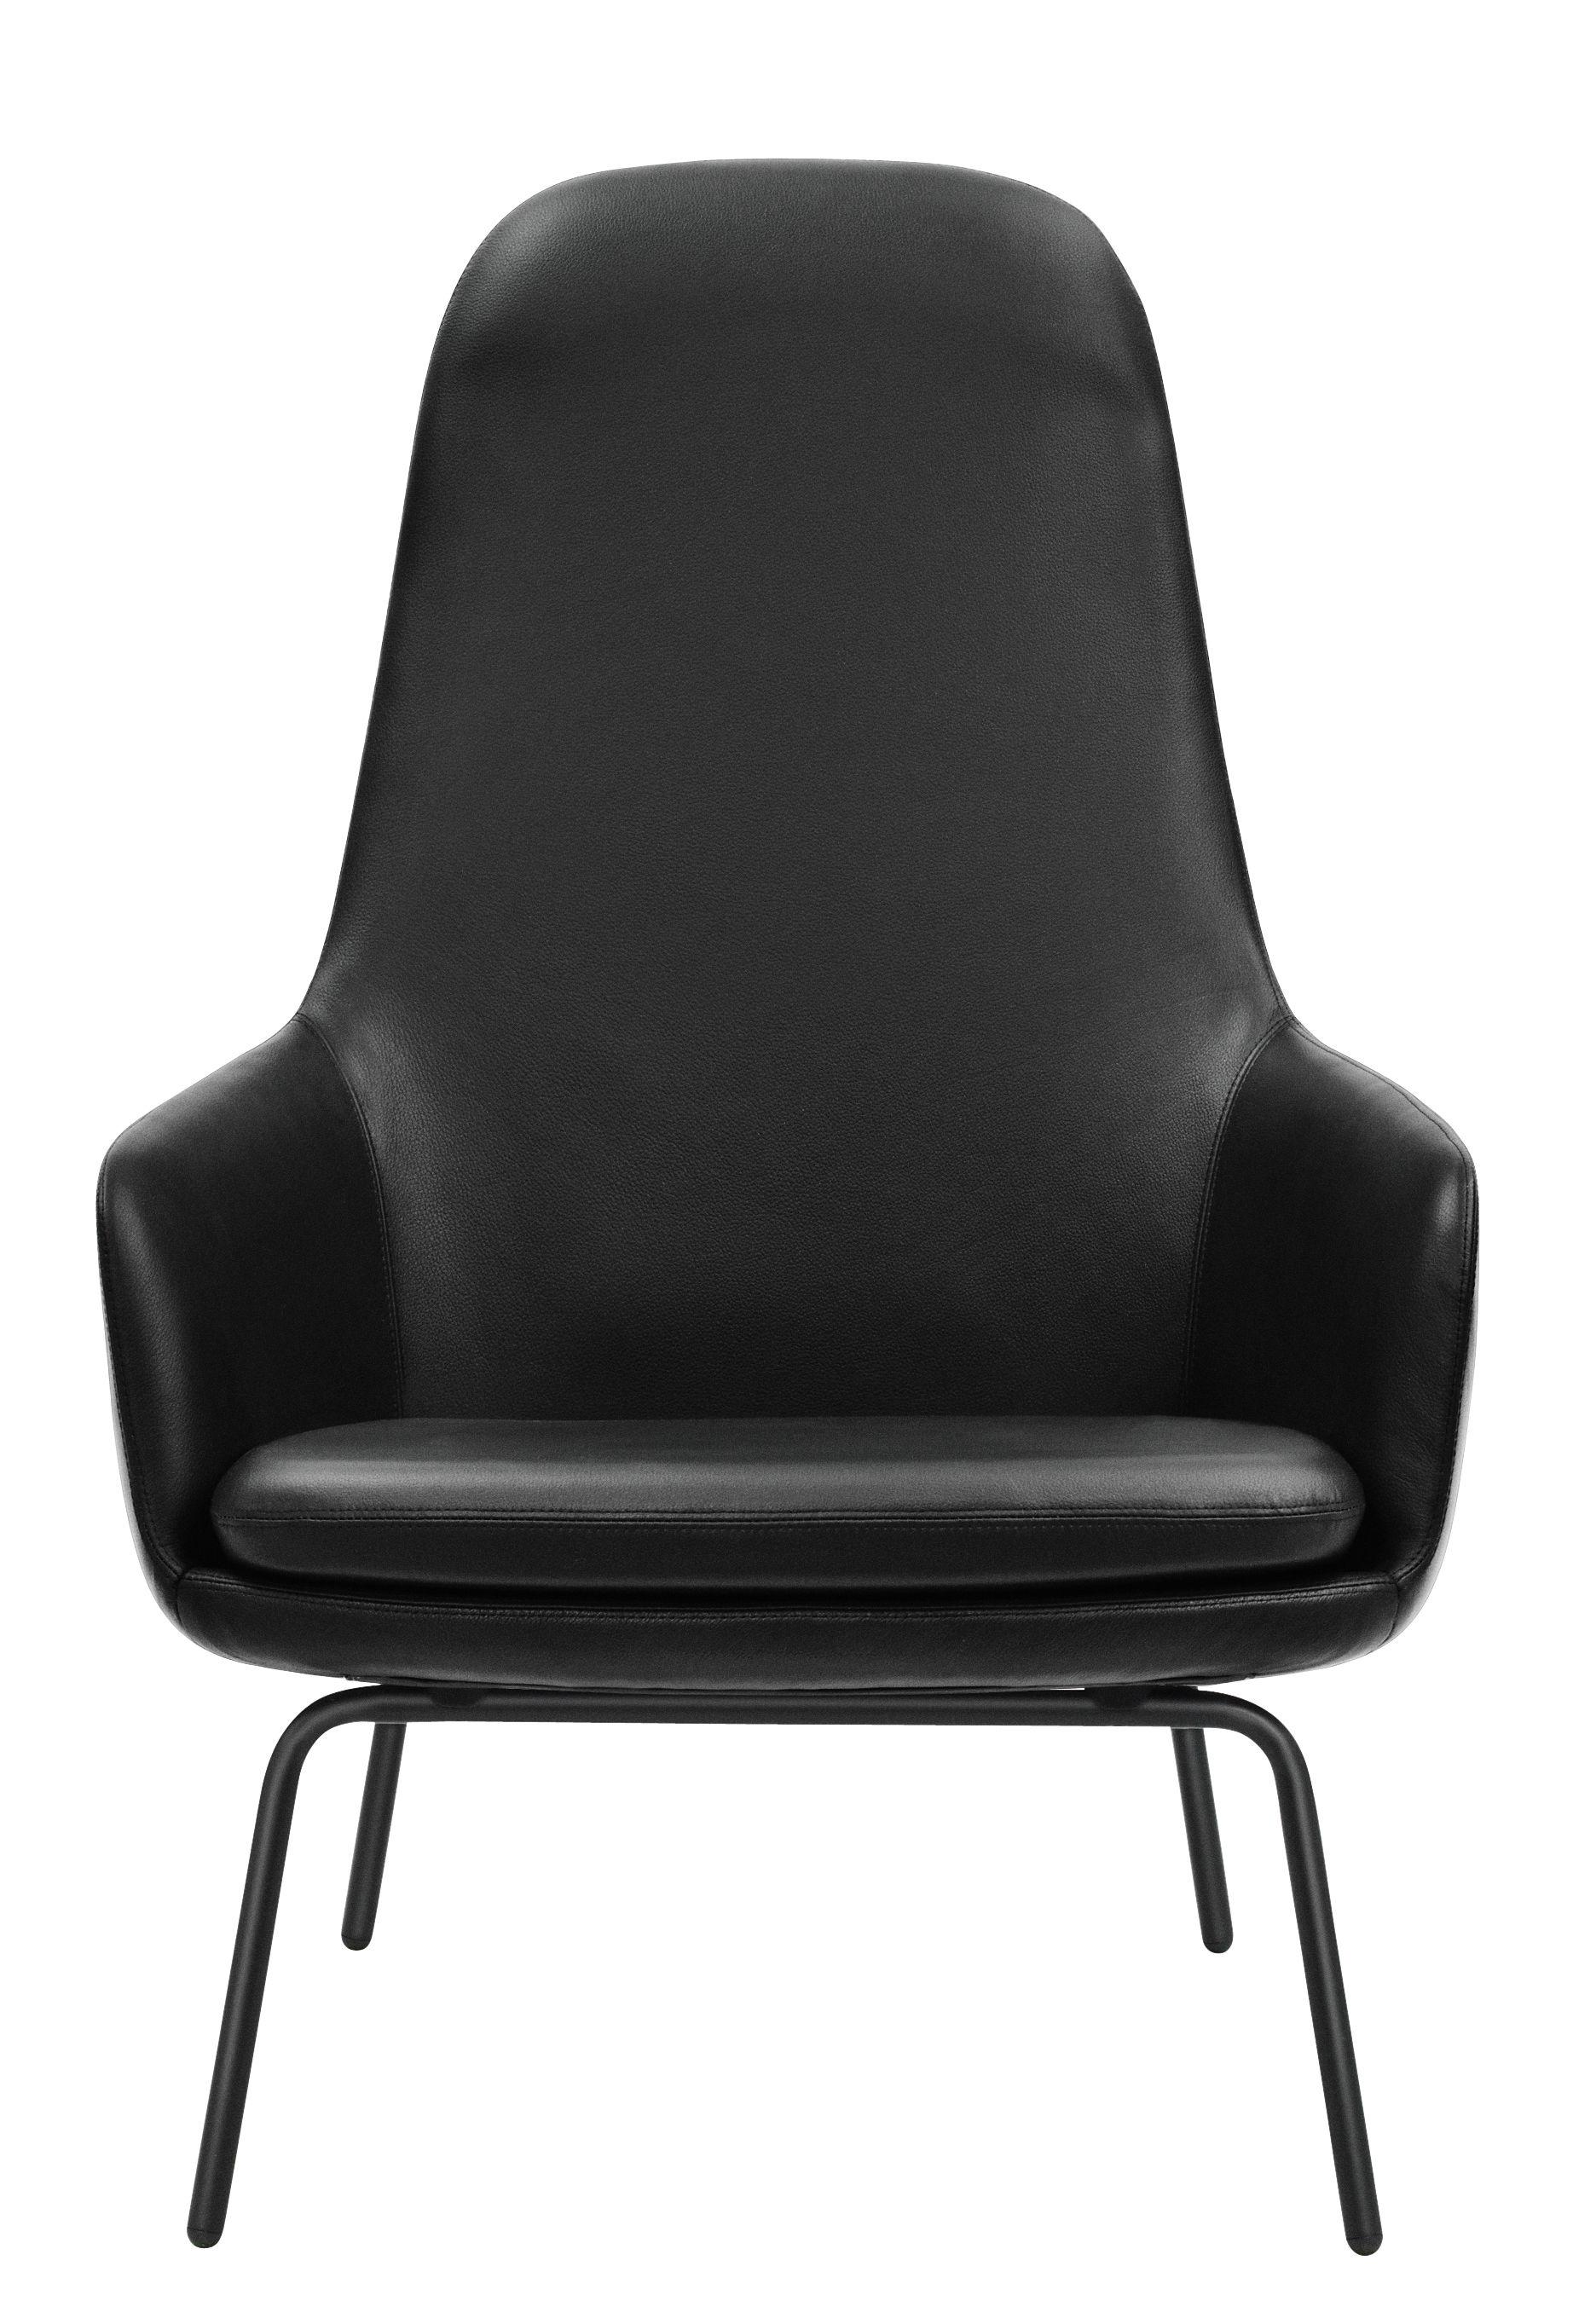 fauteuil era dossier haut cuir m tal cuir noir pieds noirs normann copenhagen. Black Bedroom Furniture Sets. Home Design Ideas